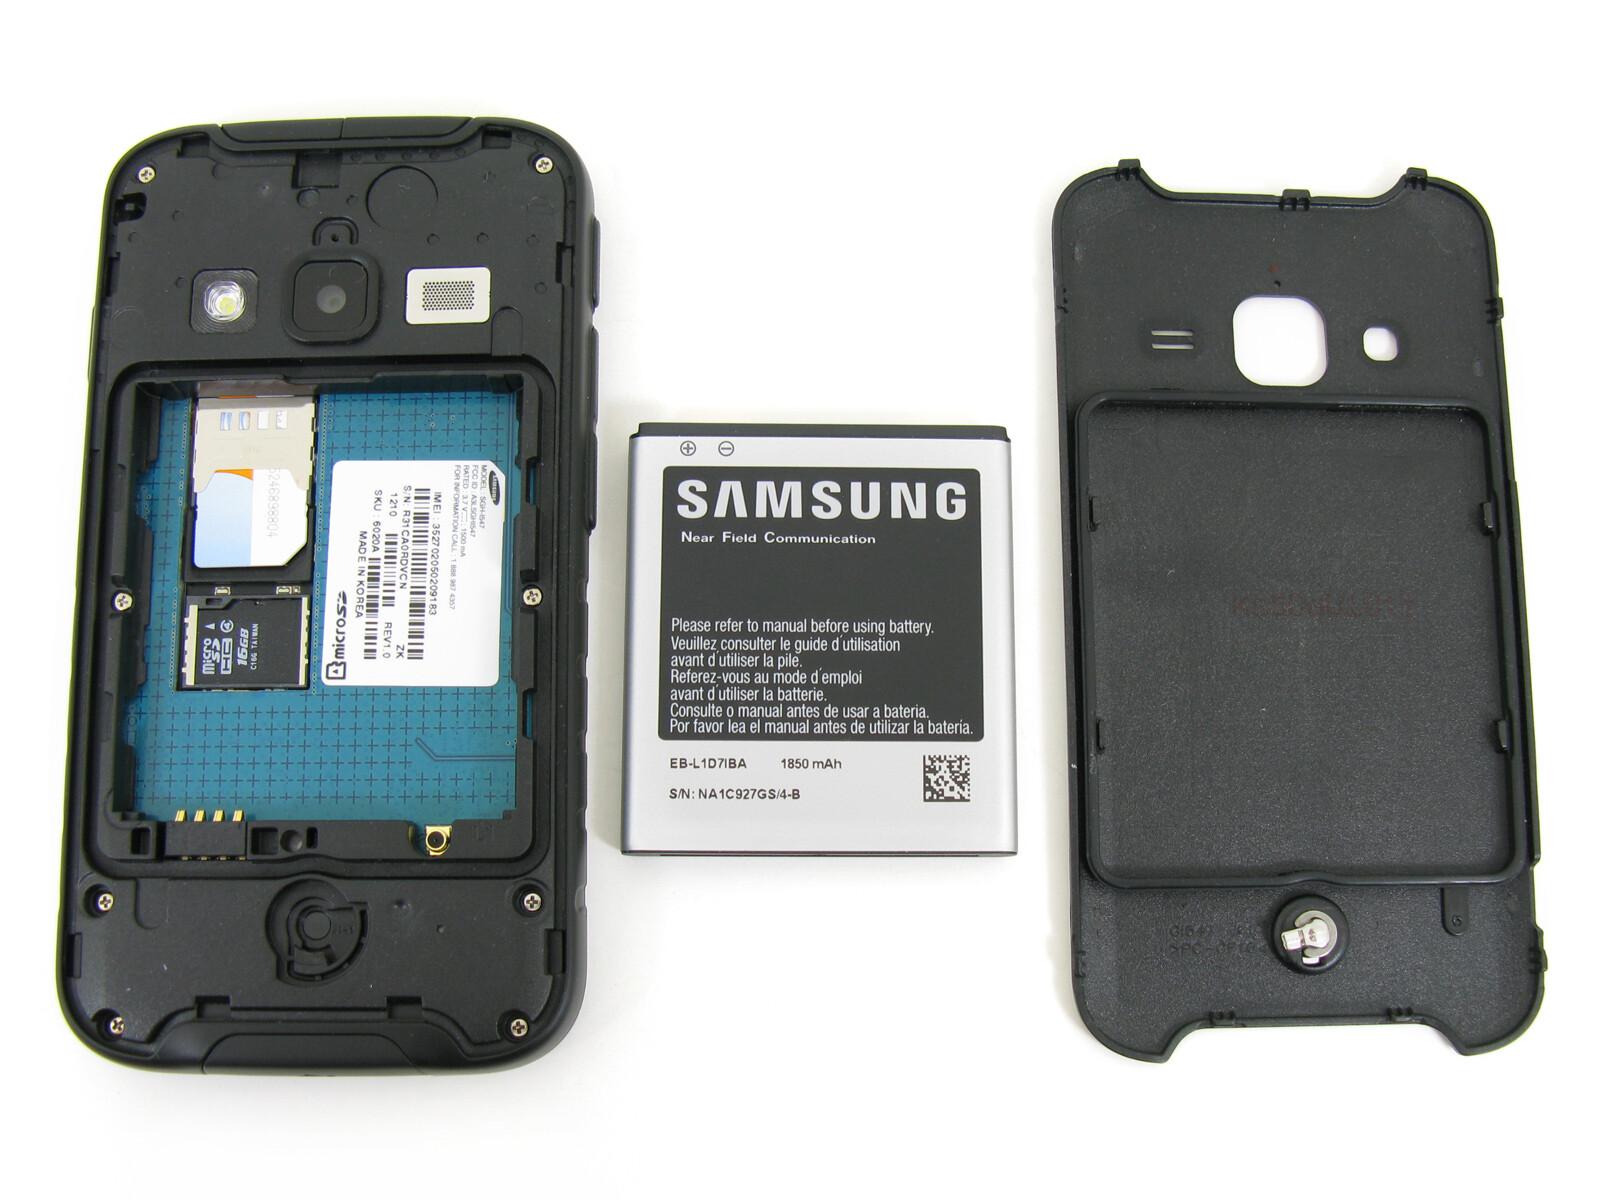 samsung galaxy rugby pro photos rh phonearena com Samsung Rugby Pro Cases Samsung Rugby 4 Flip Phone